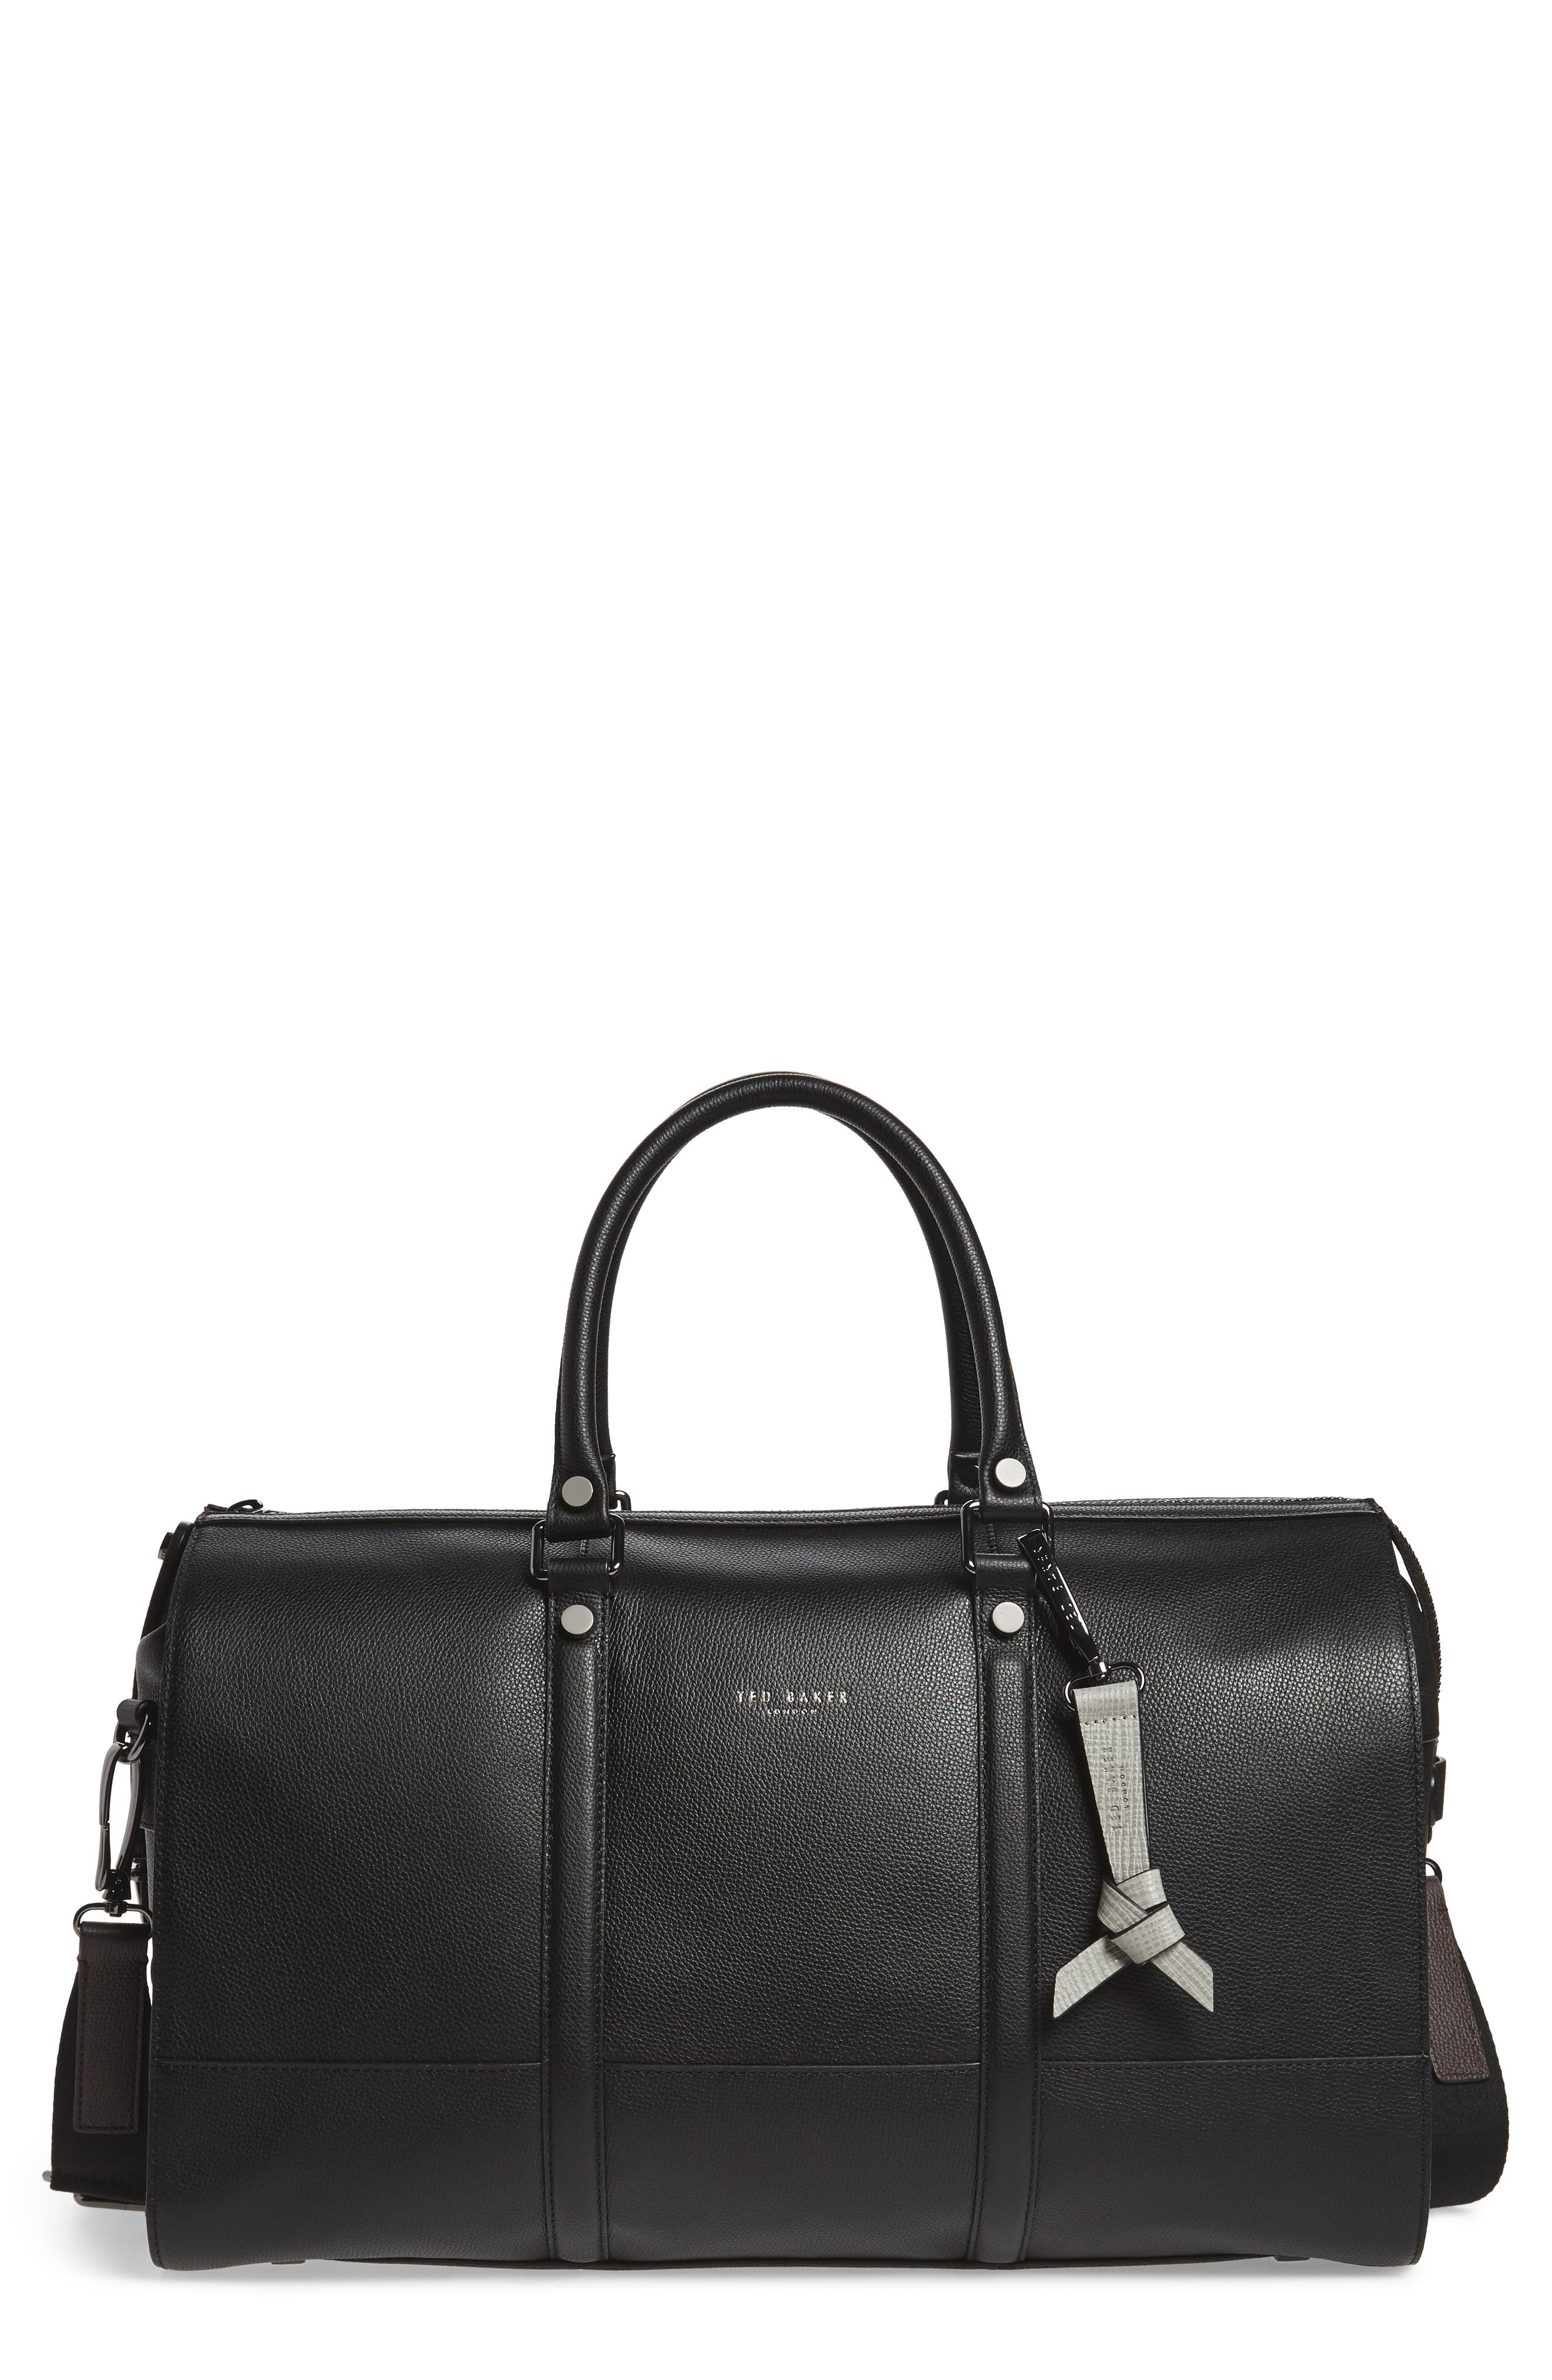 Leather Duffel Bag,                             Main thumbnail 1, color,                             001